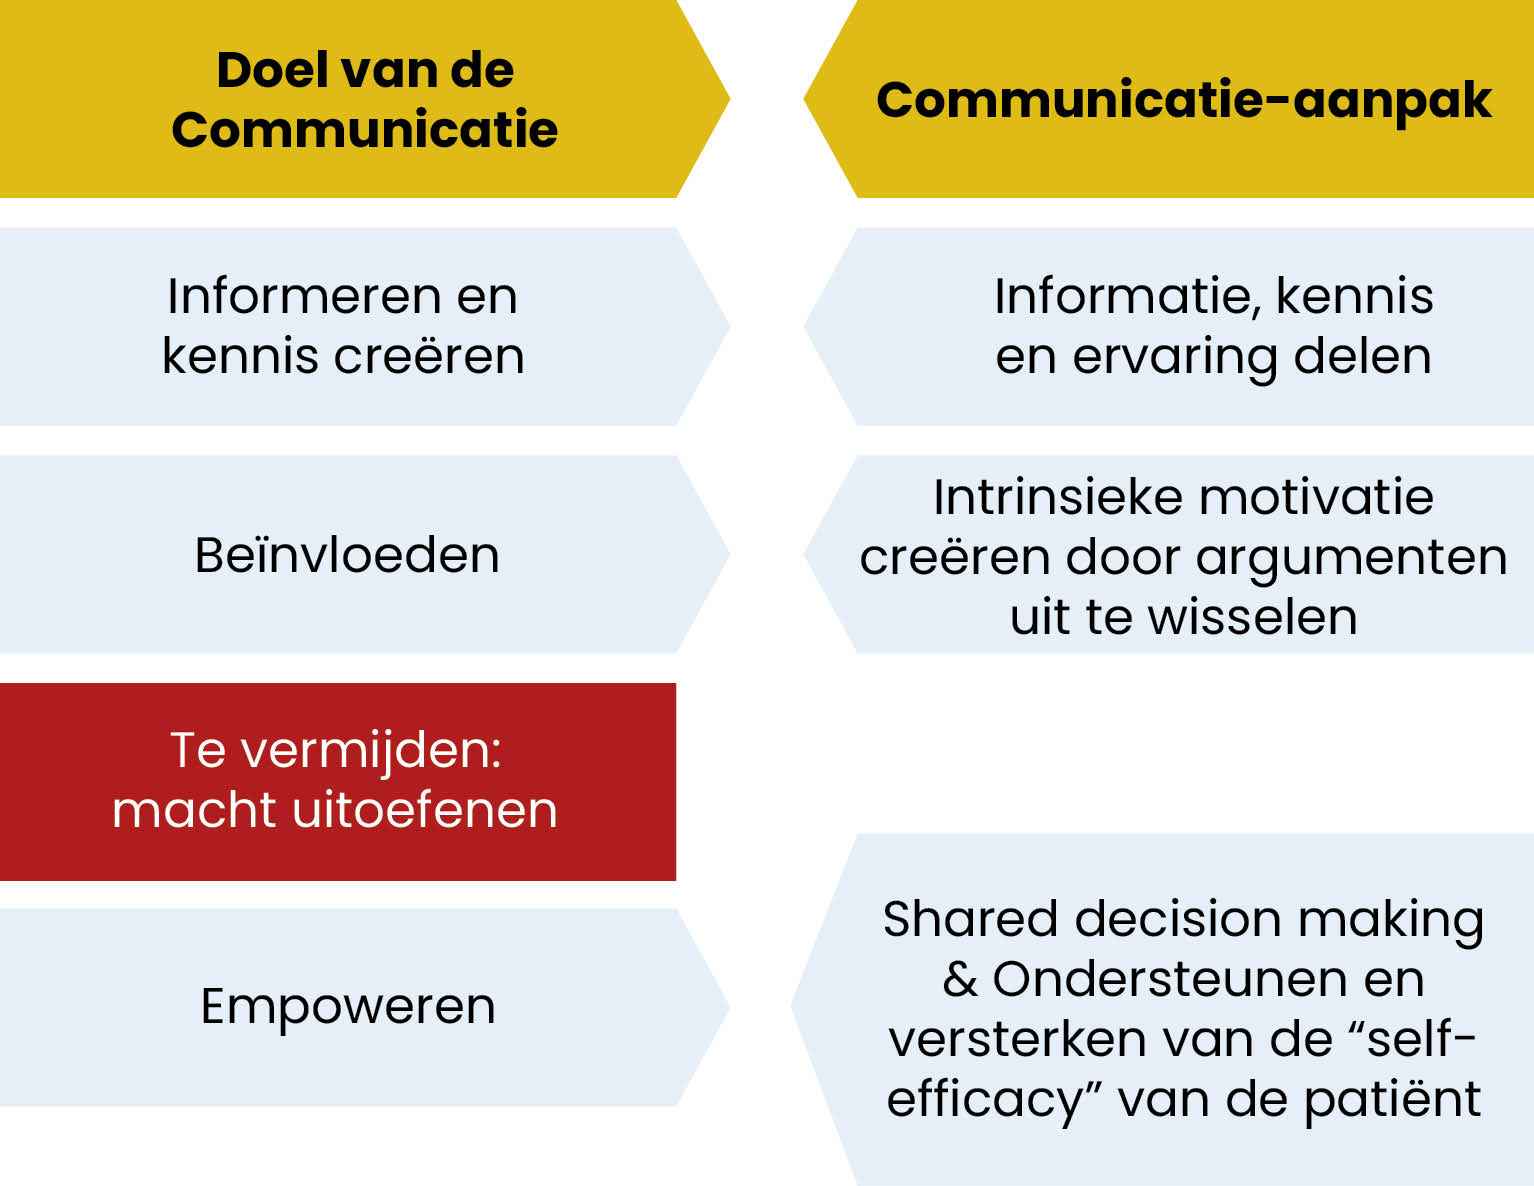 doel-com-com-aanpak (1)